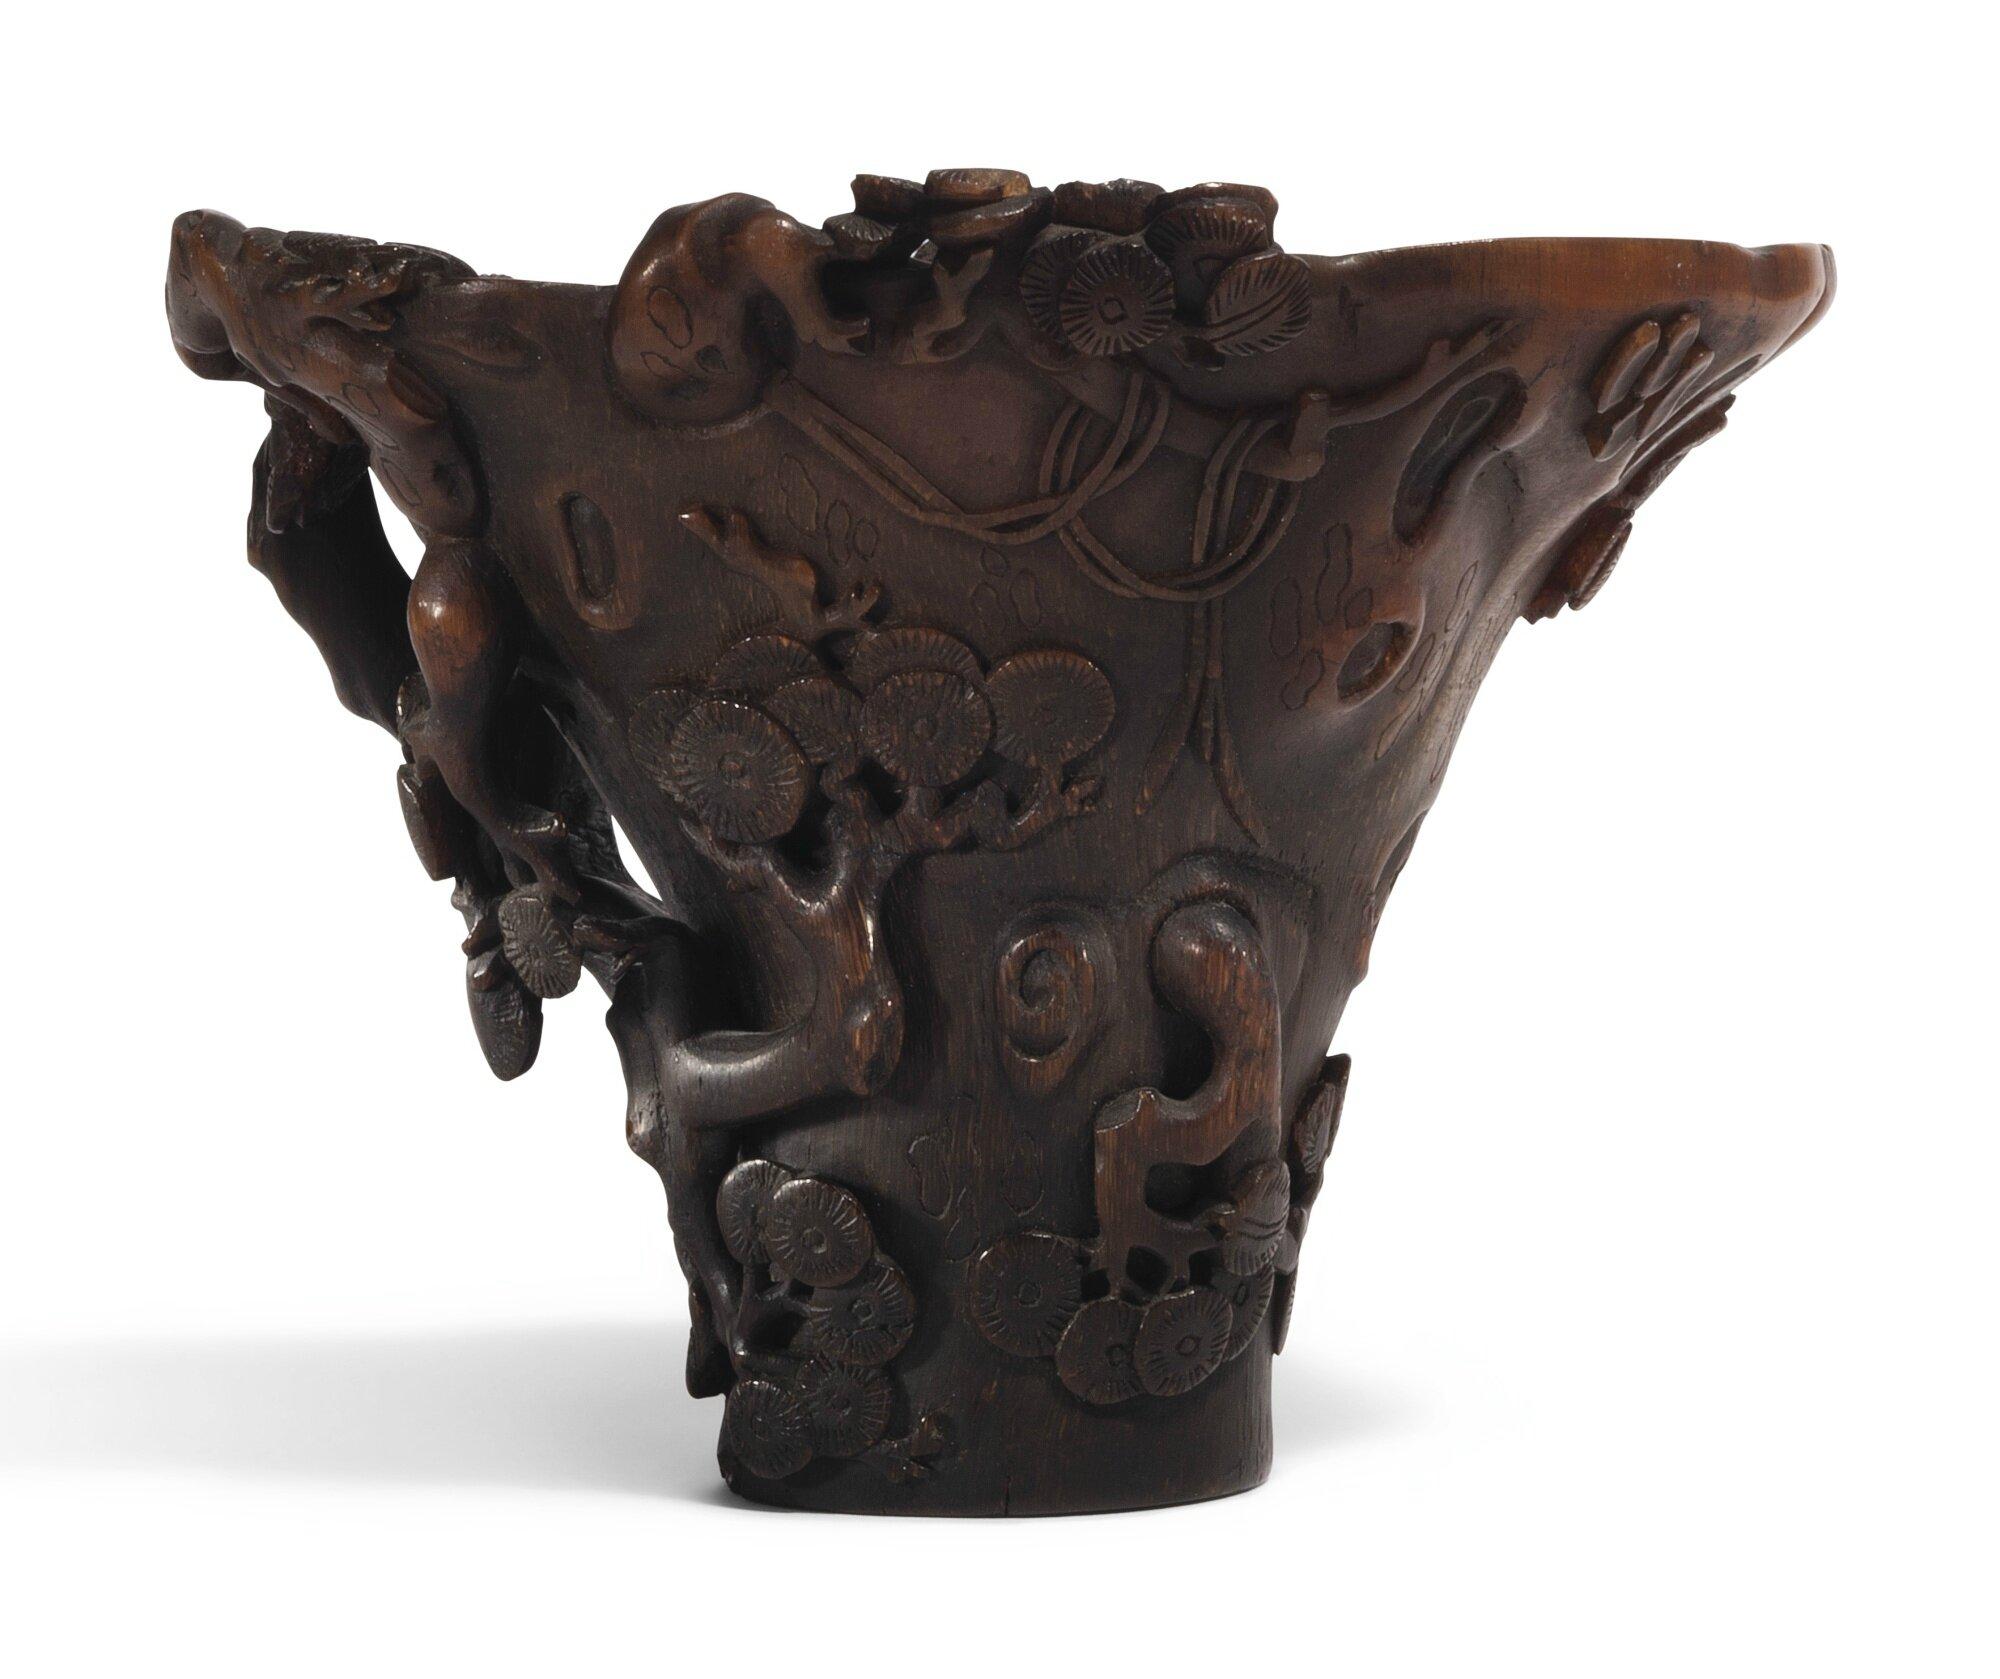 A rhinoceros horn 'pine' libation cup, Qing dynasty, 17th - 18th century